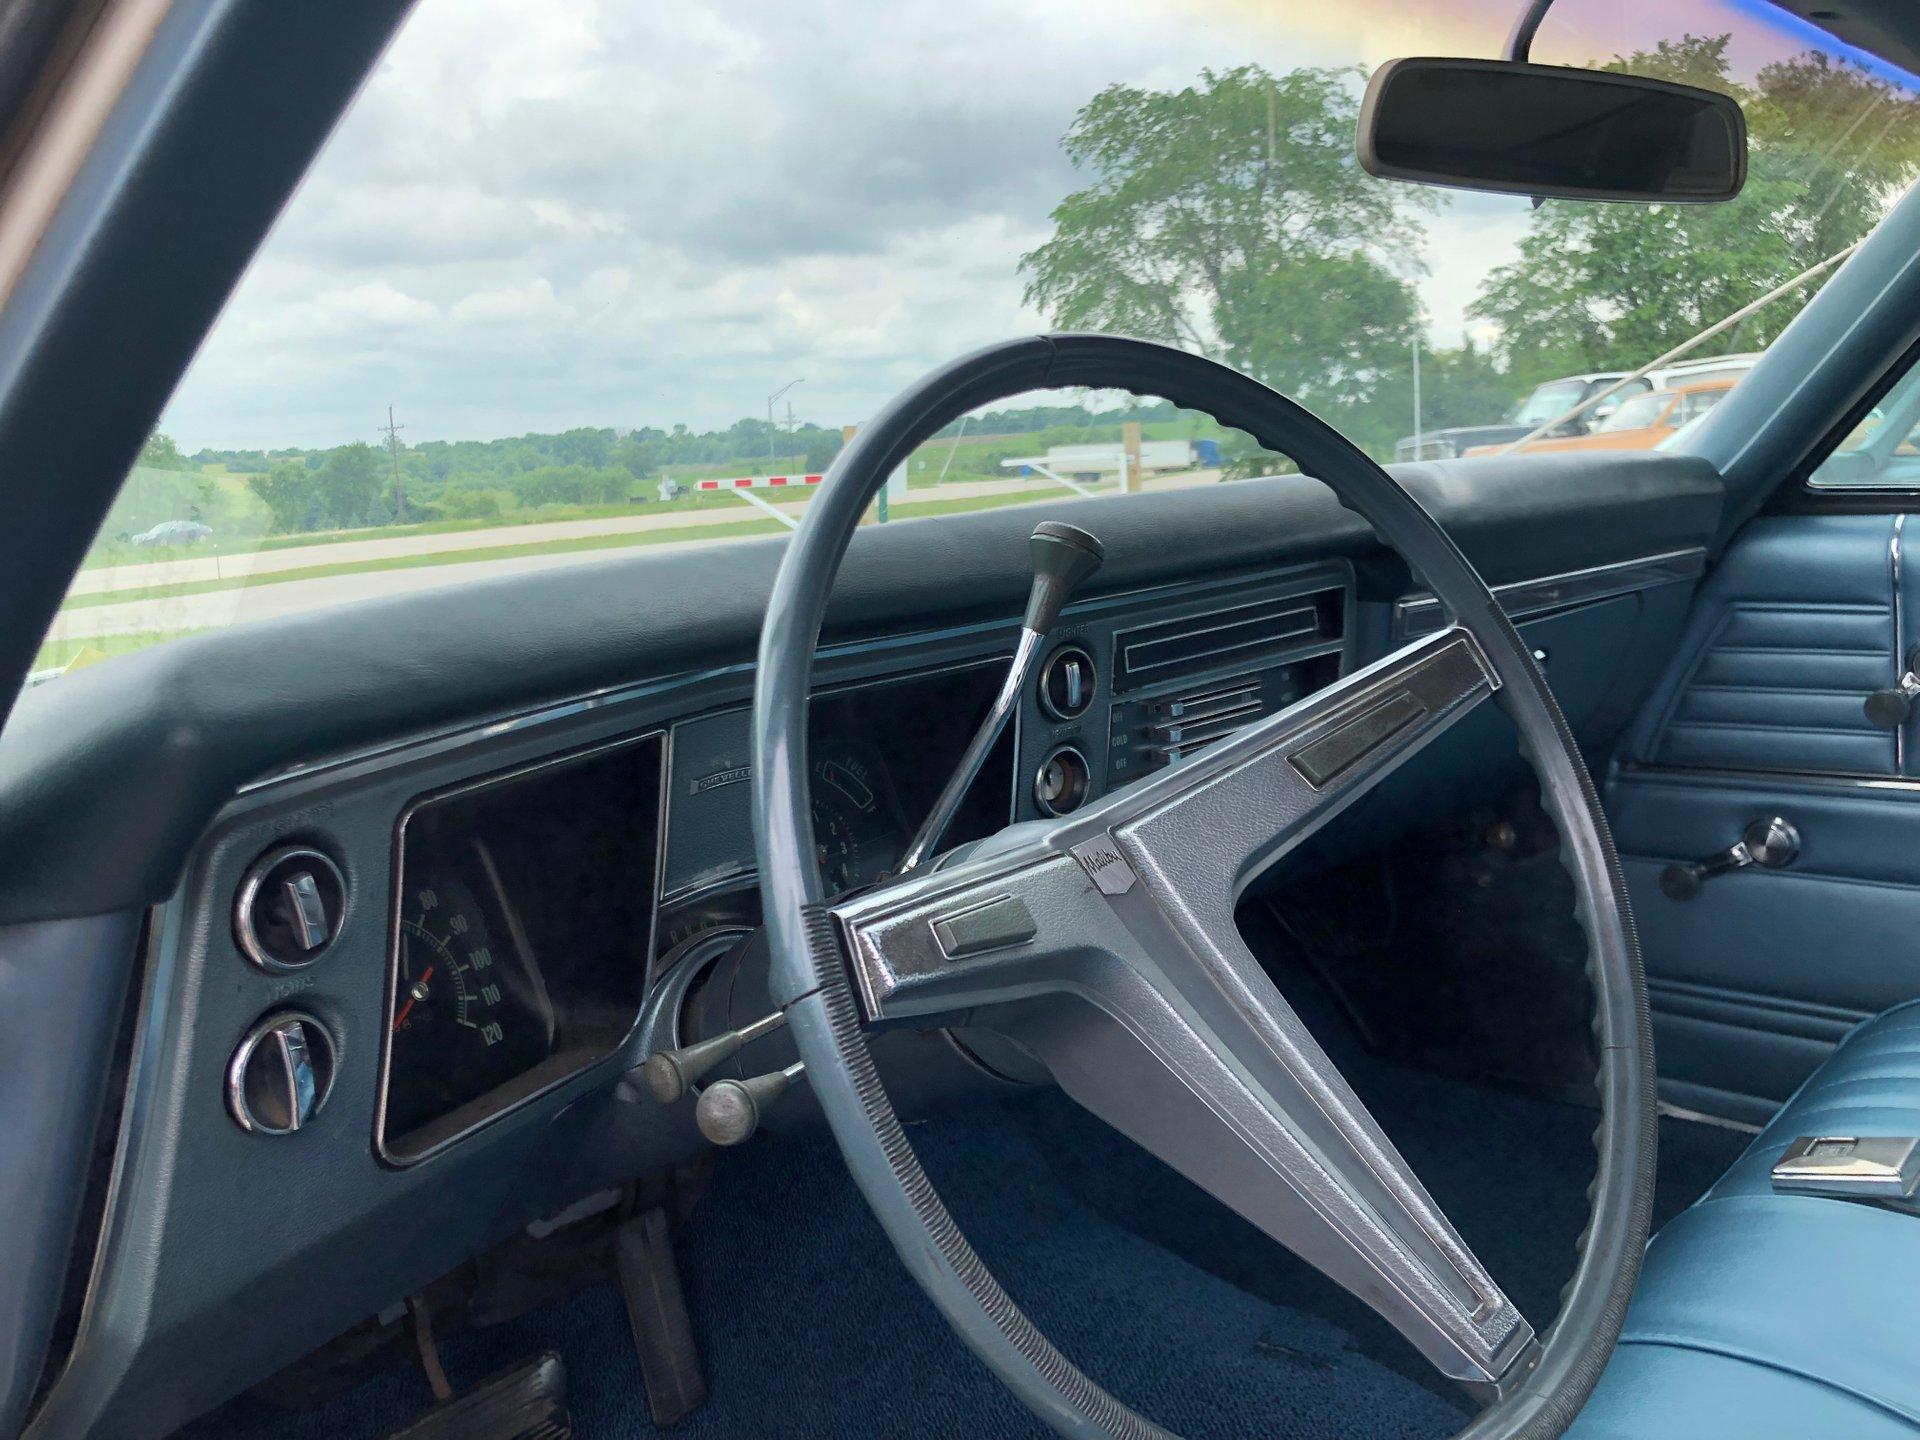 1968-chevrolet-chevelle (14).jpeg